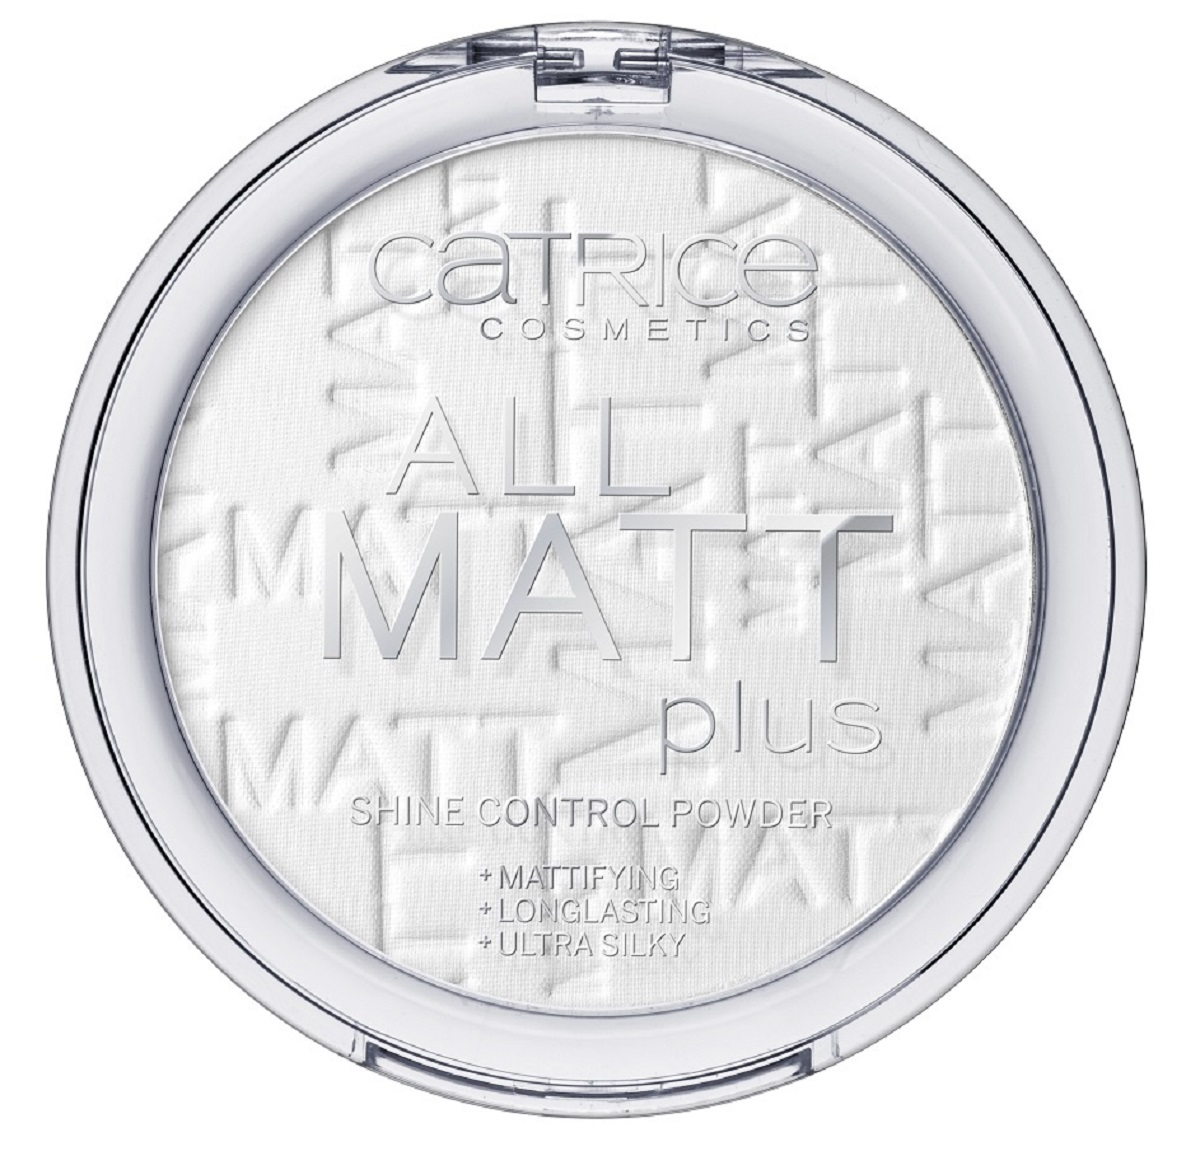 CatriceПудра компактная All Matt Plus Shine Control Powder 001, цвет: прозрачный